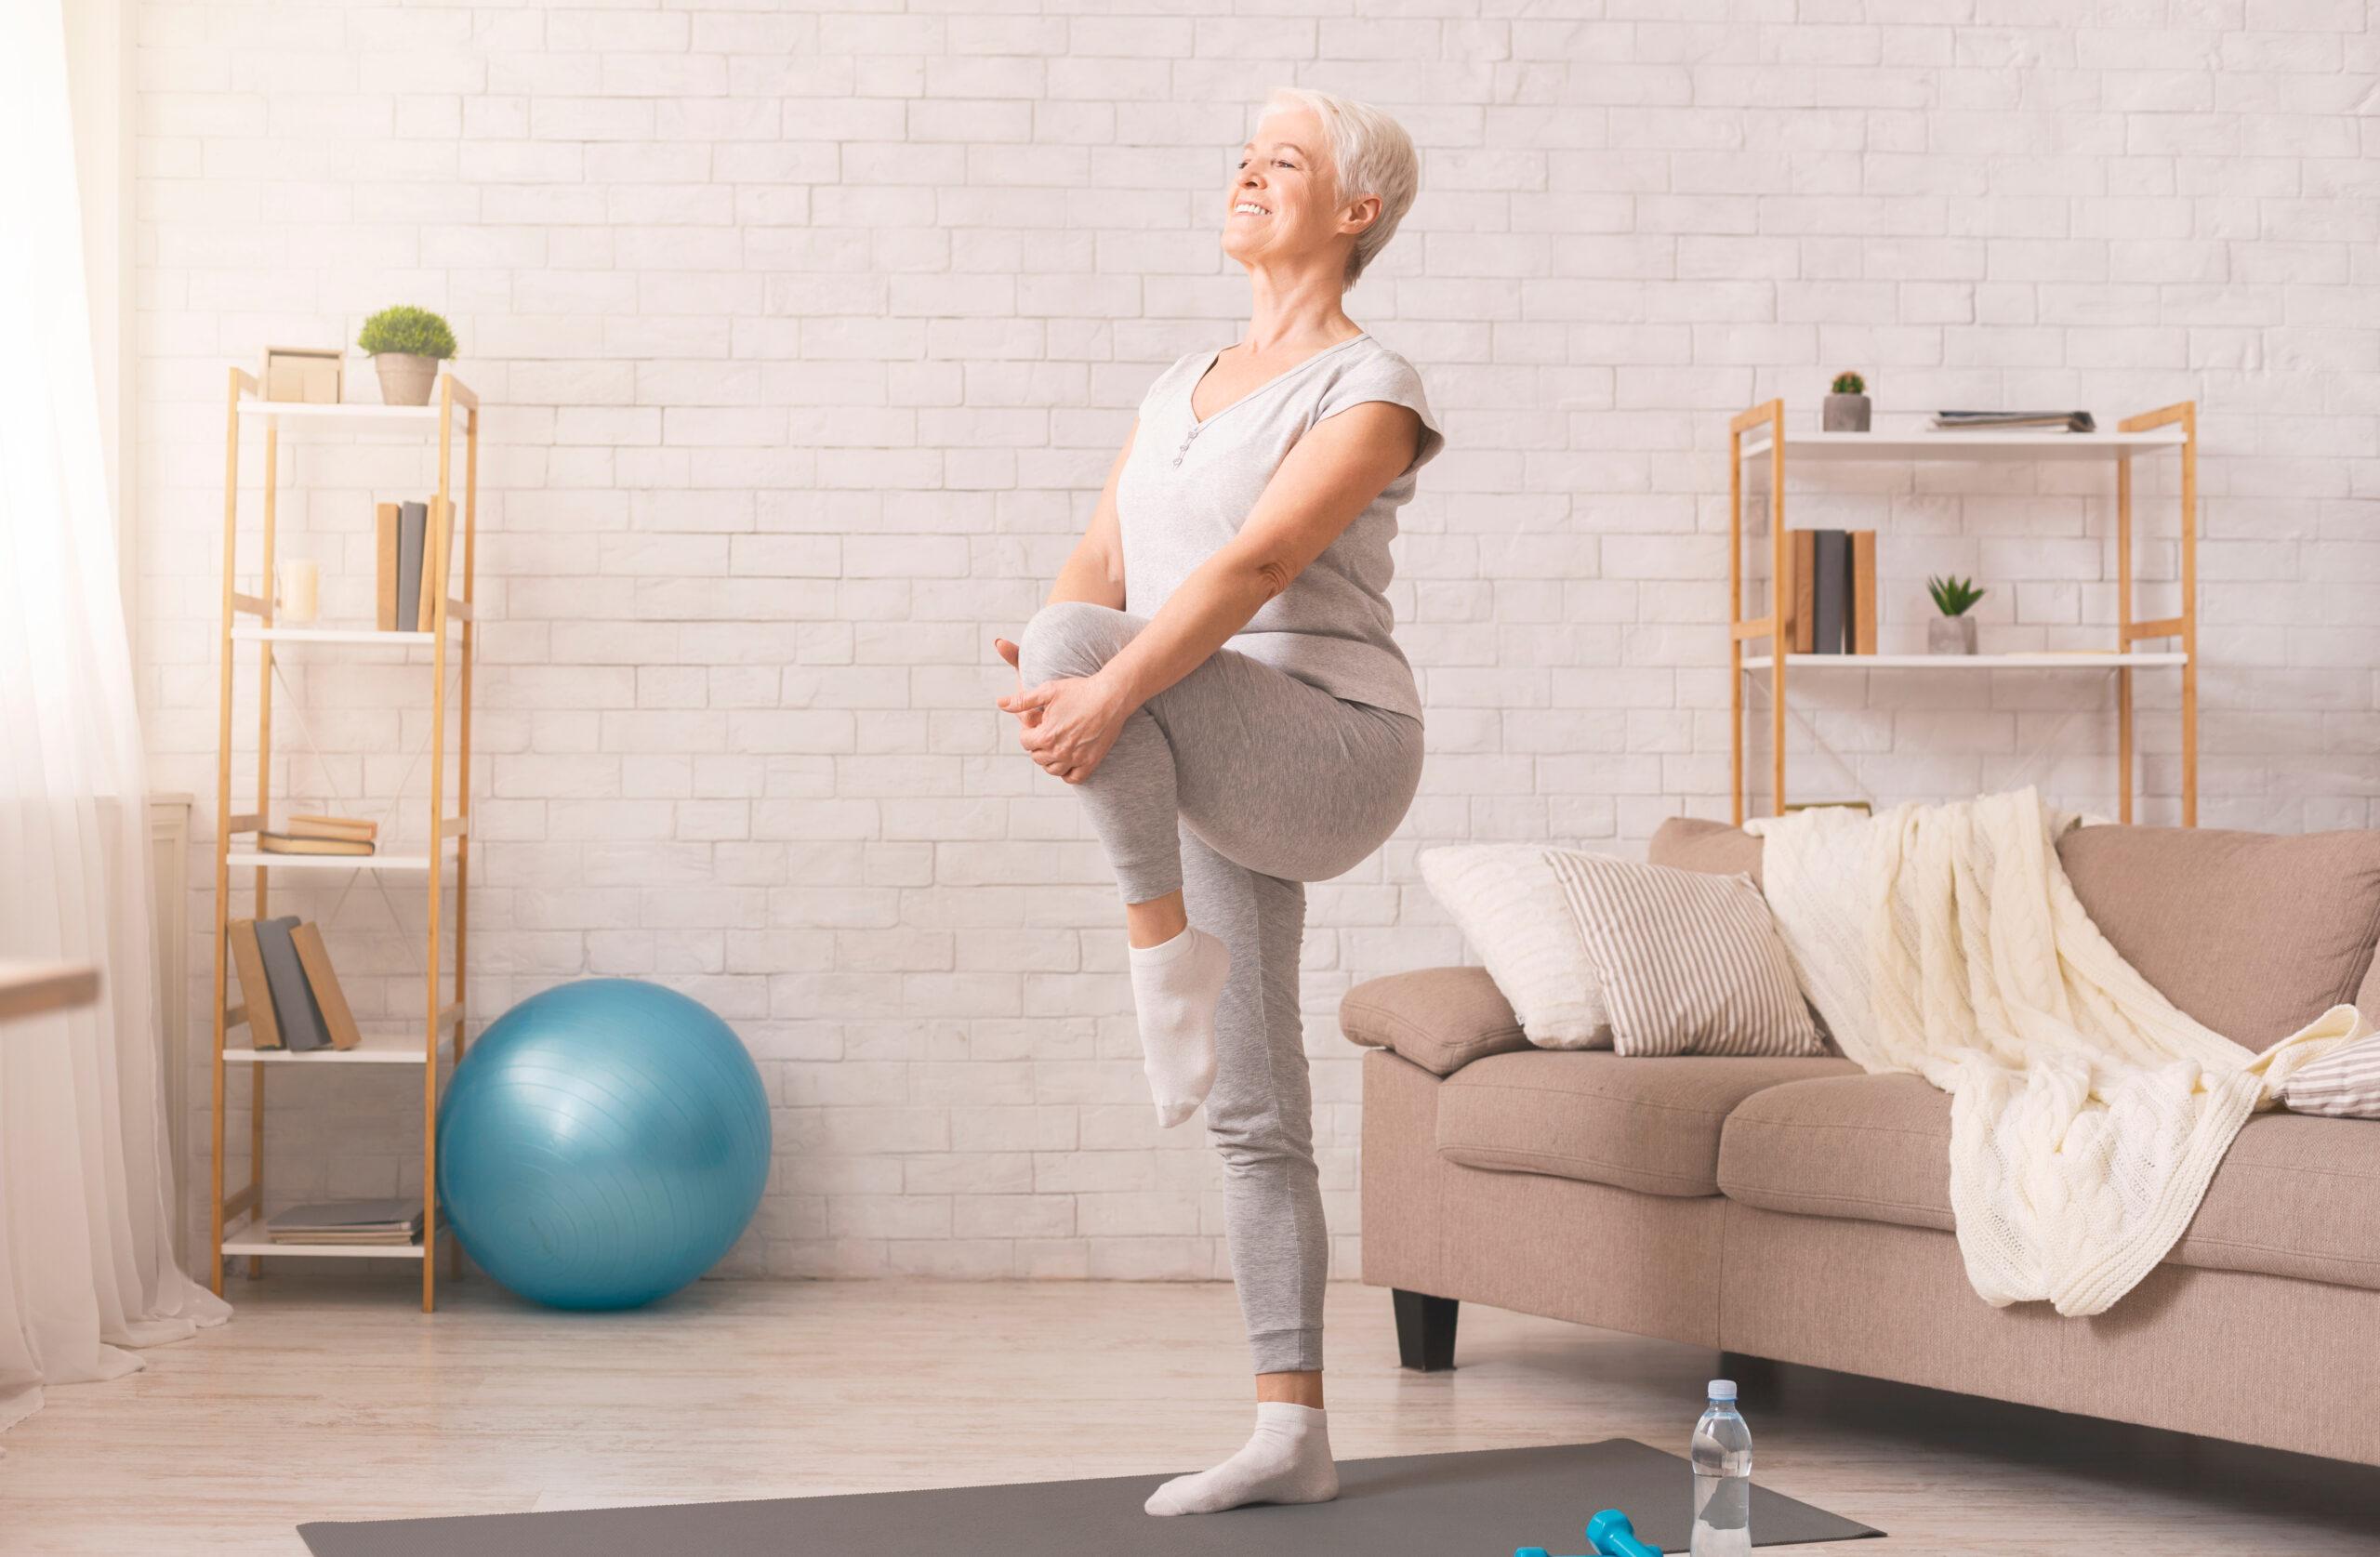 Improving balance for fall prevention